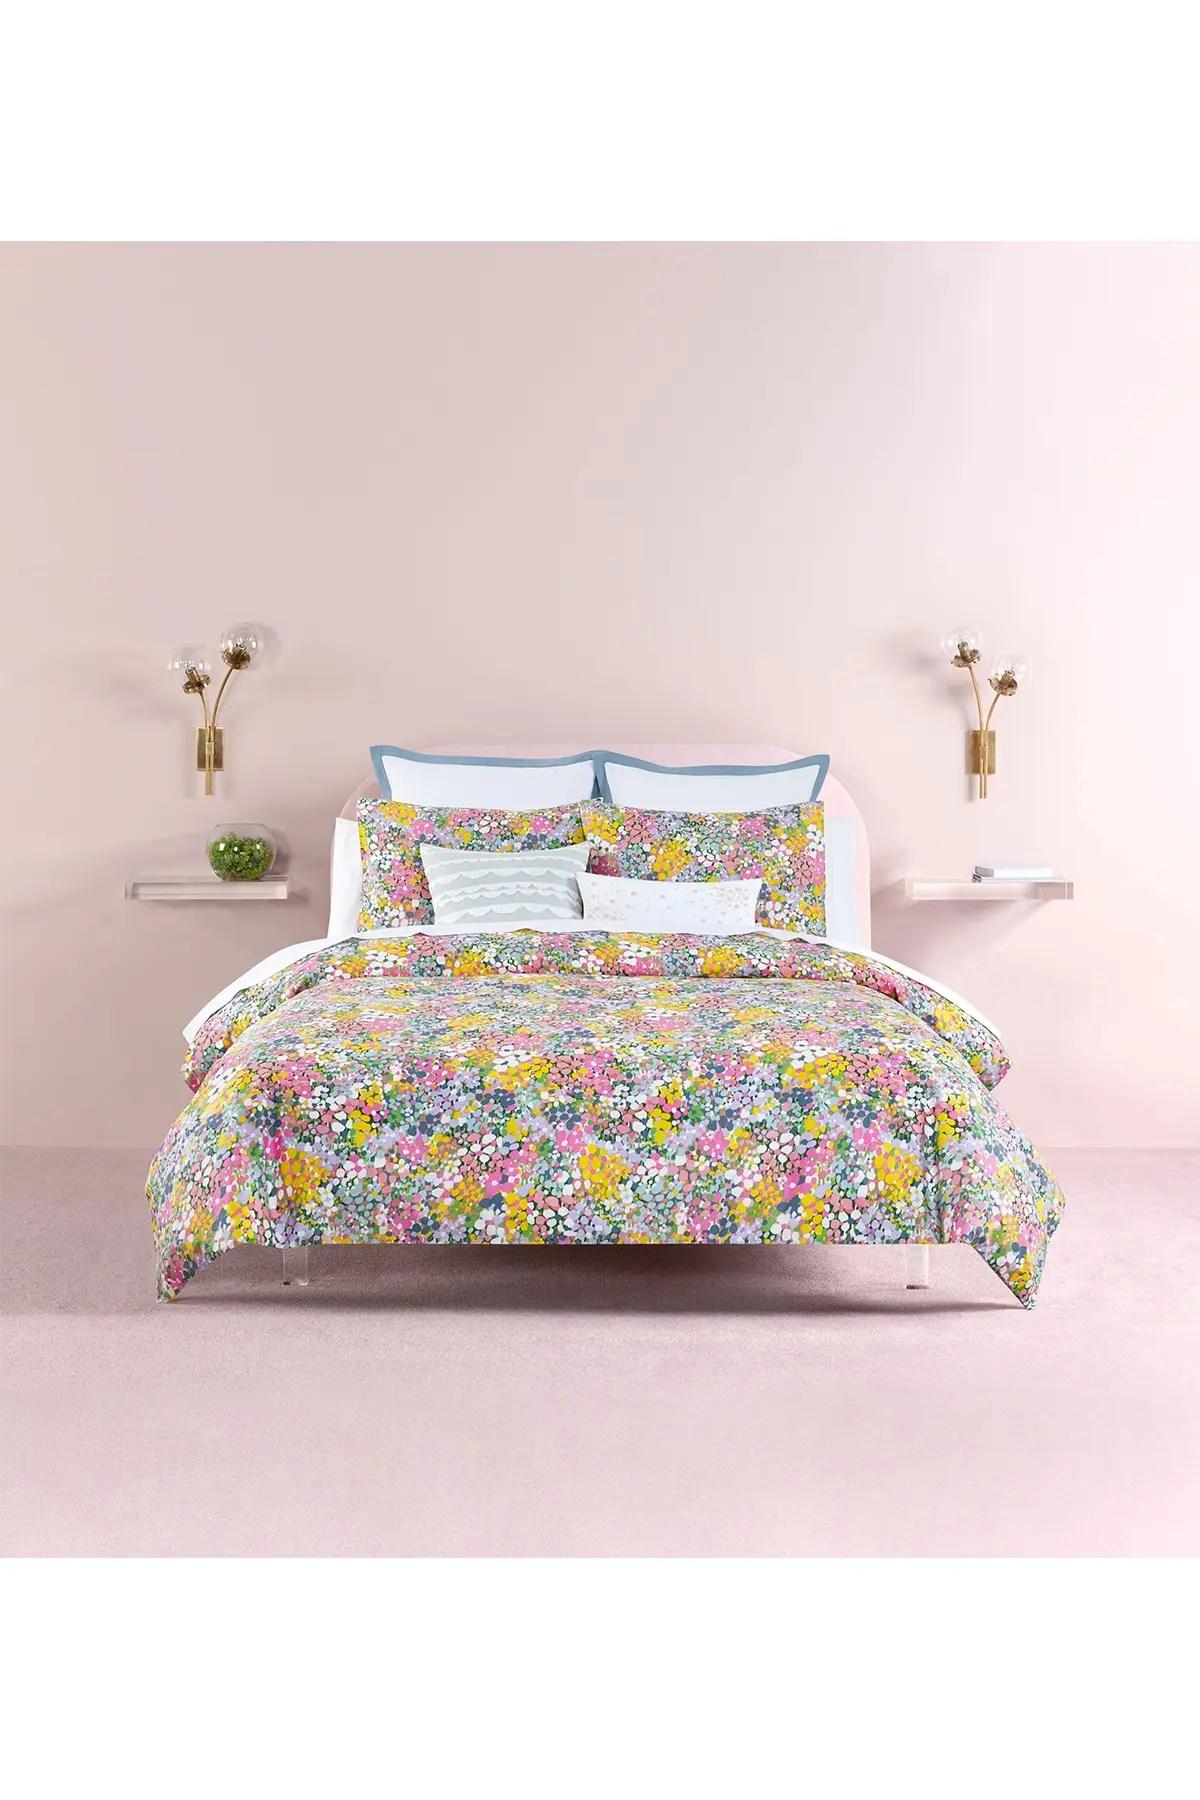 kate spade new york floral dots comforter 3 piece set king lilac nordstrom rack